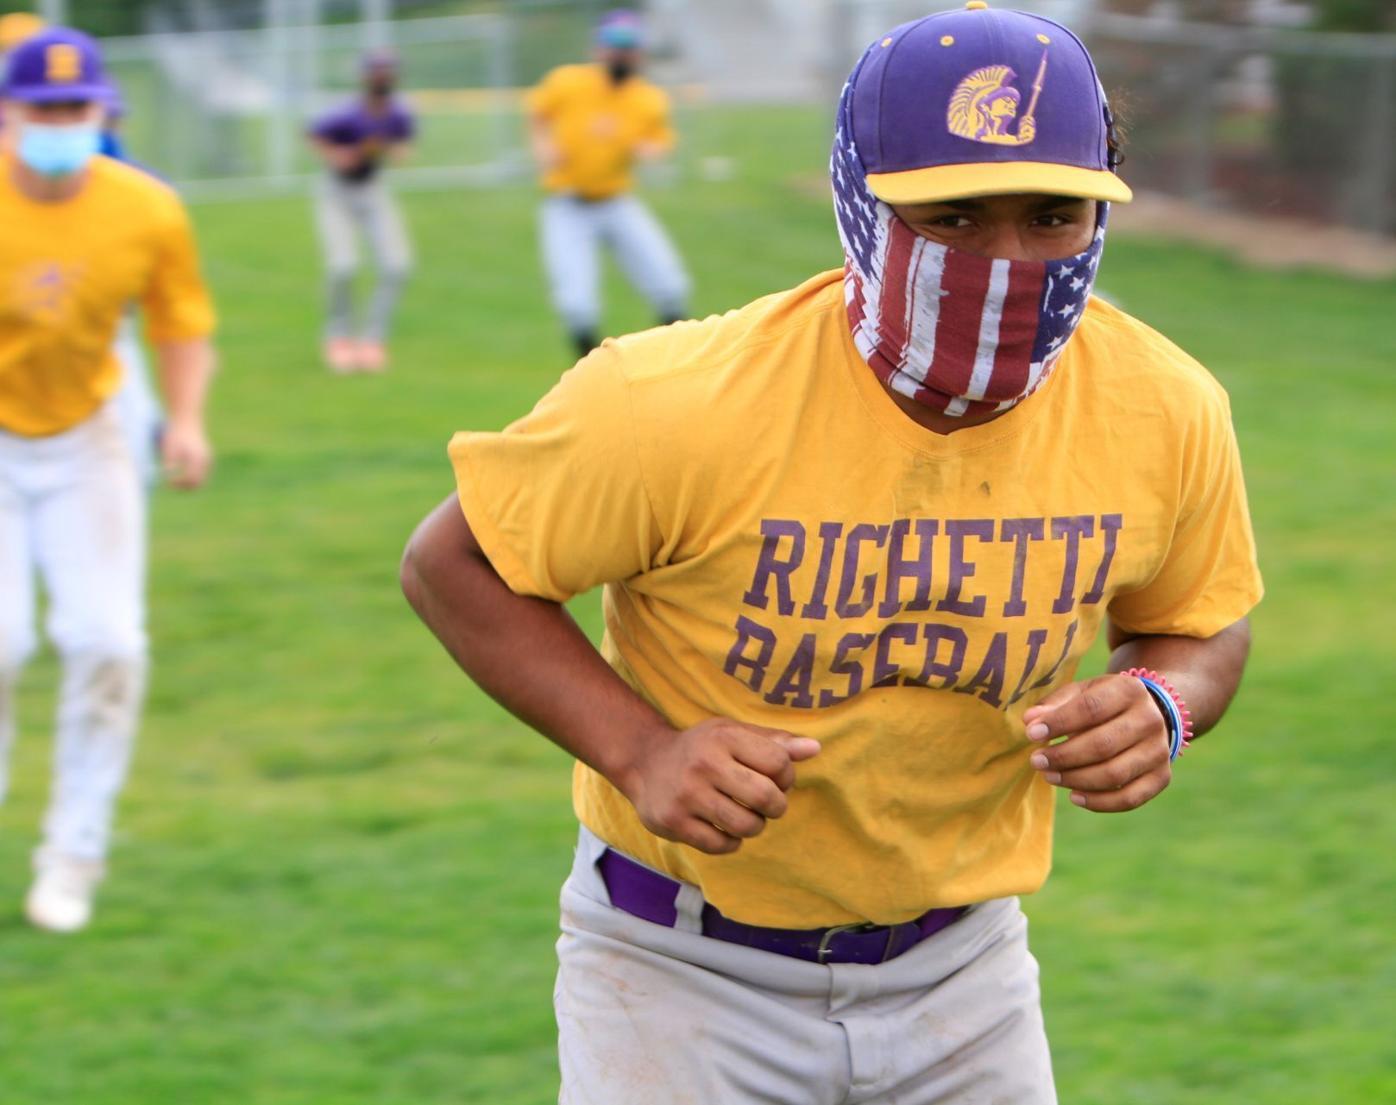 02321 Righetti Baseball 03.JPG